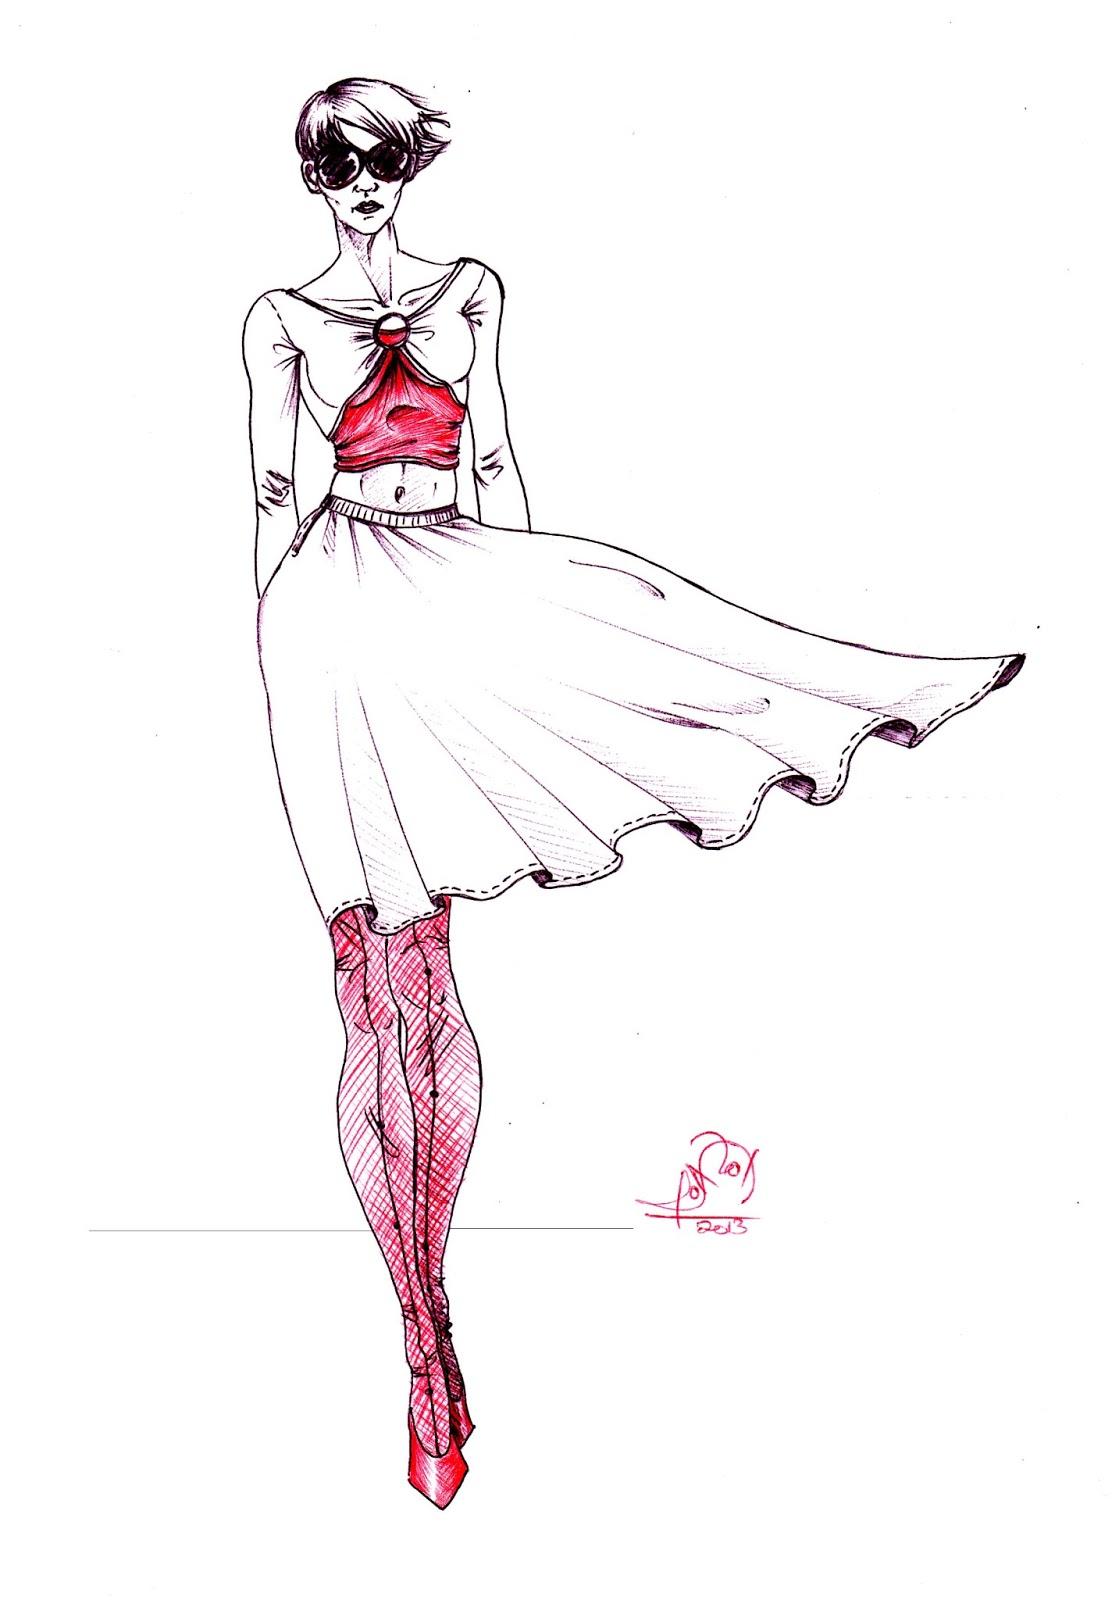 Dibujo Anatómico y Figurín de Moda   Bitacoram21